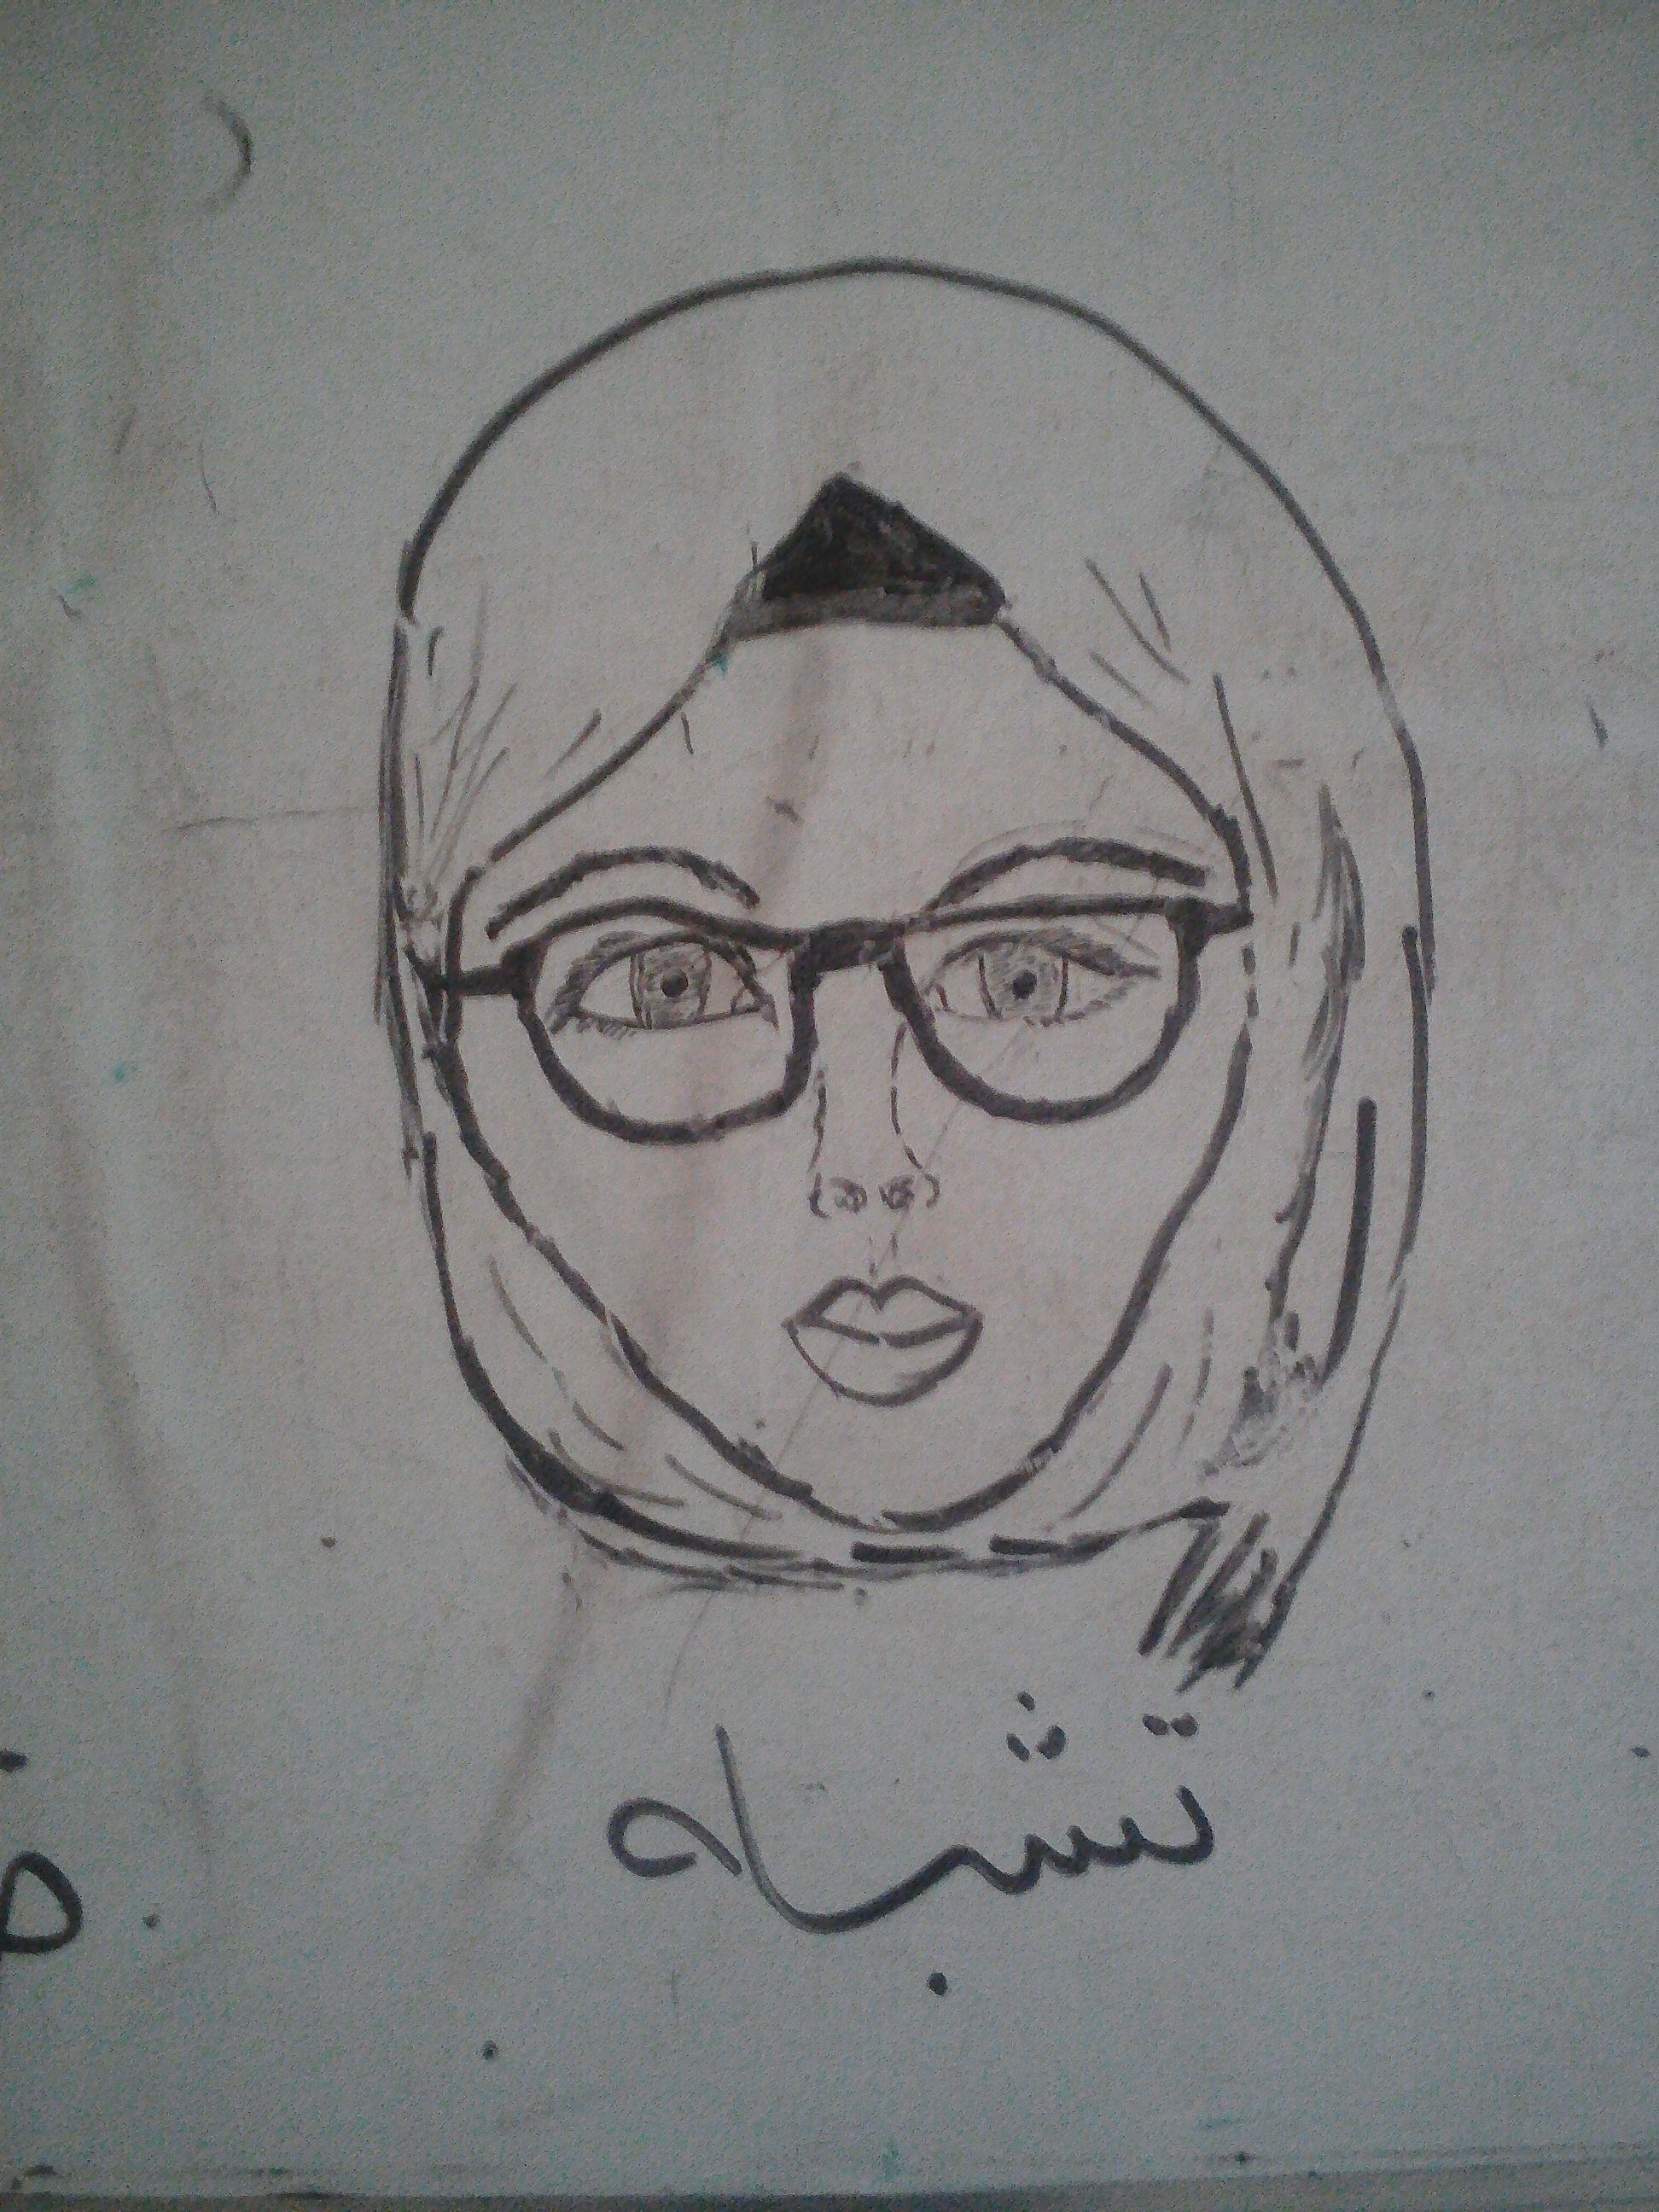 My Draw رسماتي رسم صديقتي المفضلة ضحى في صبورة القسم Male Sketch Art My Folder